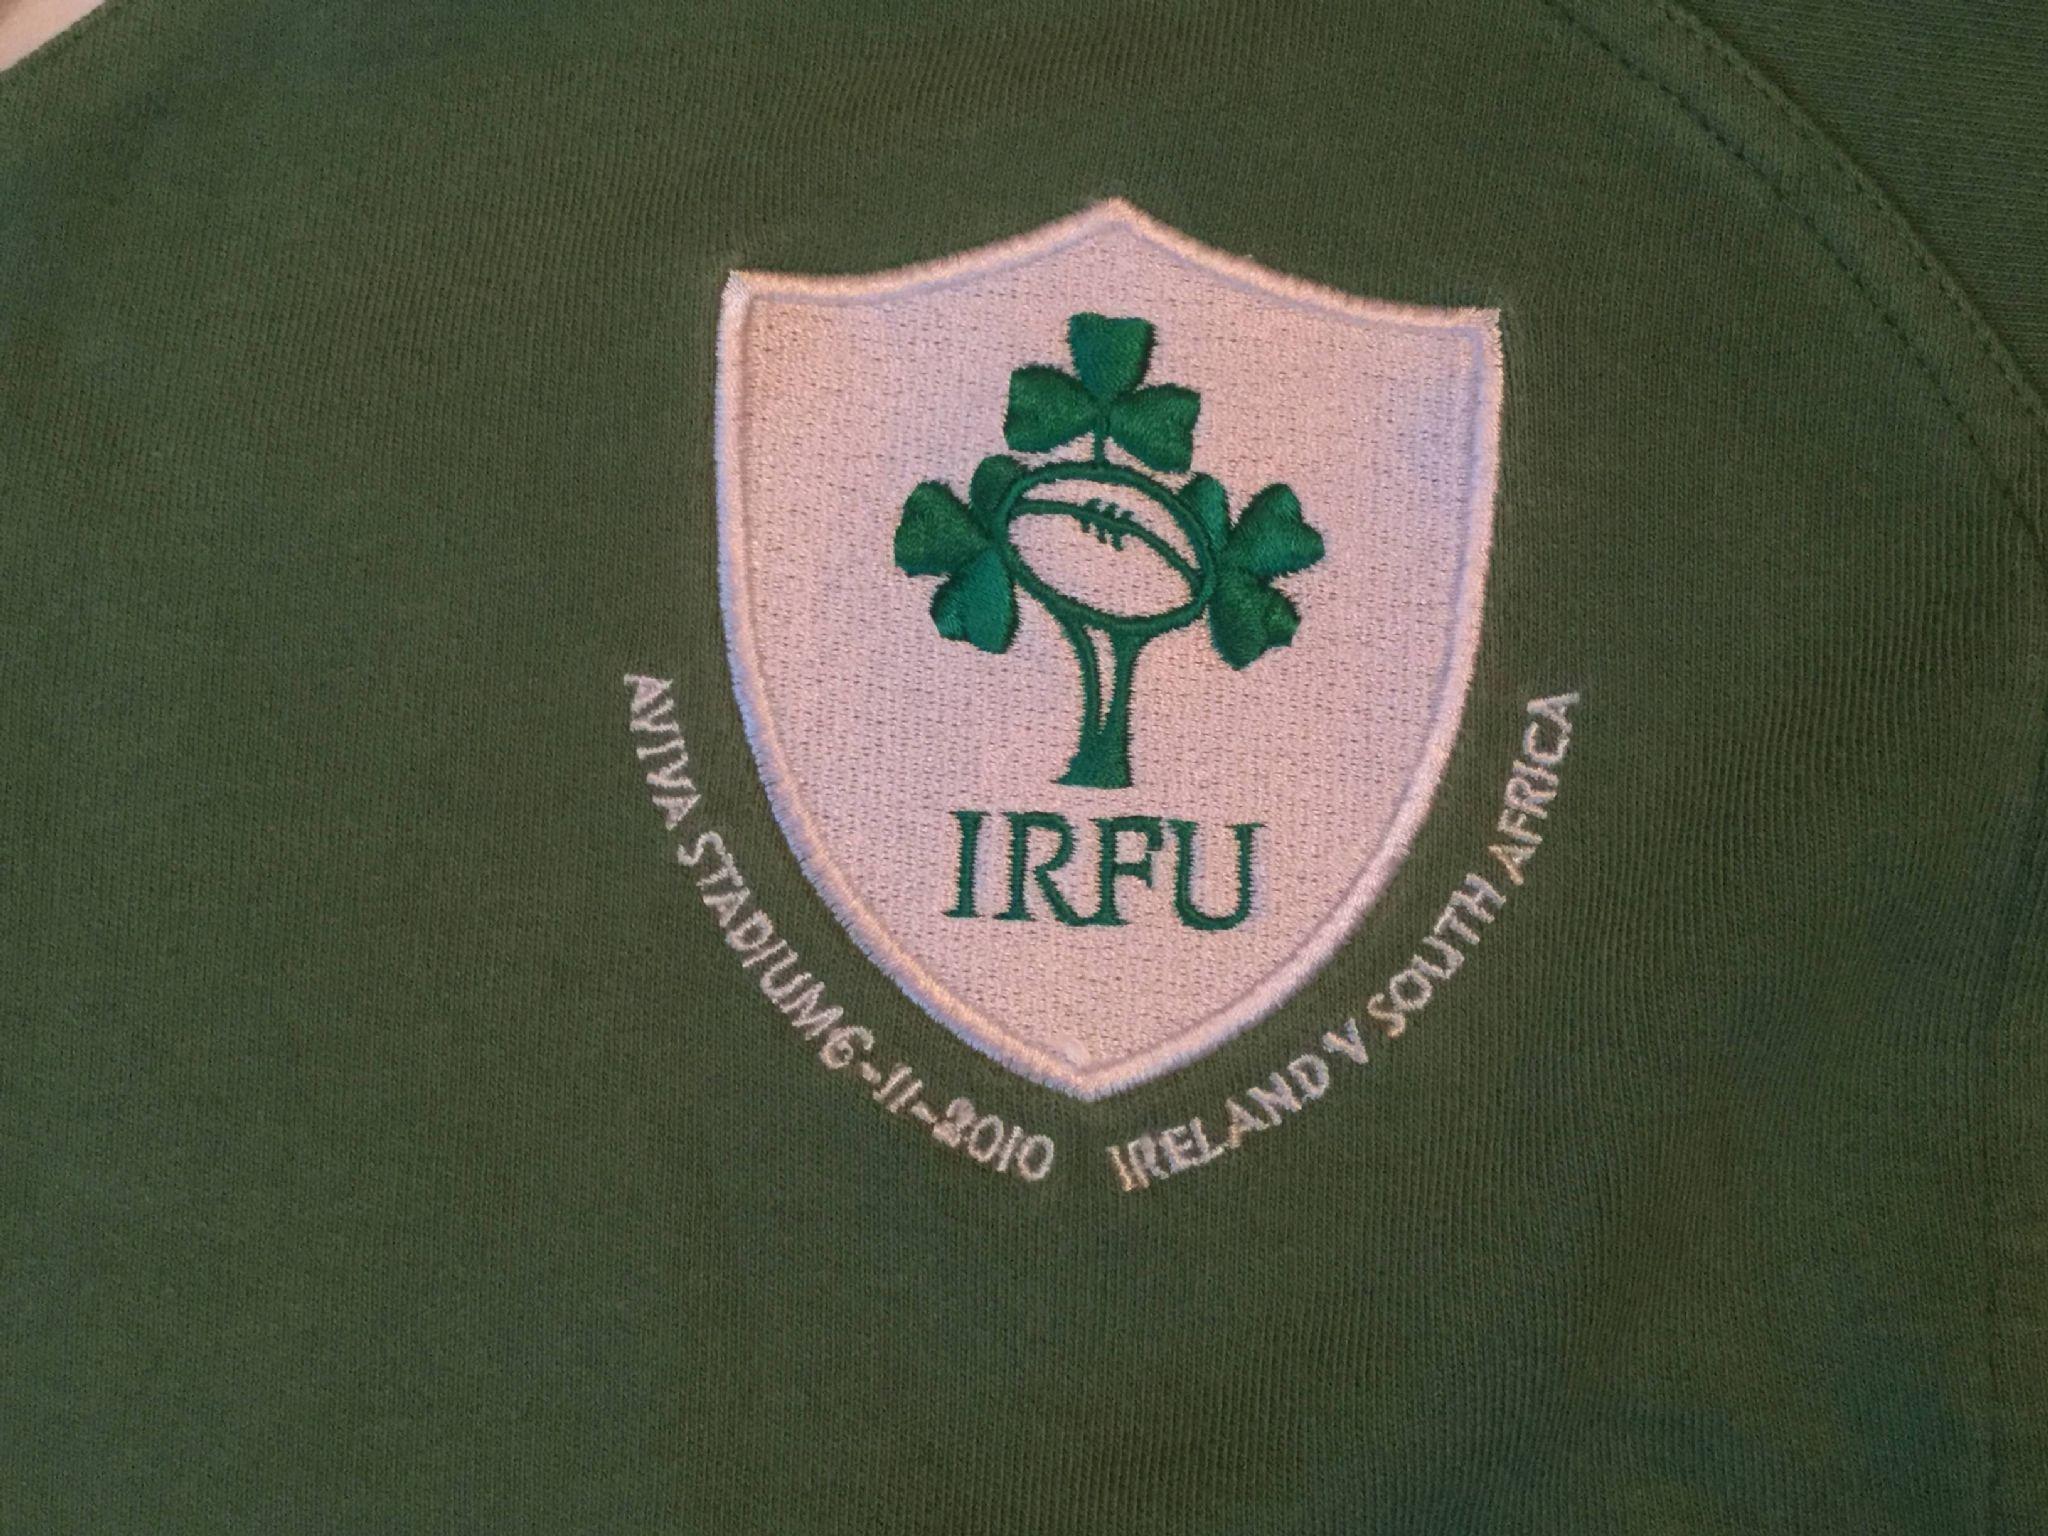 03b0c04c3 Classic Rugby Shirts | 2010 Ireland Old Vintage Union Jerseys